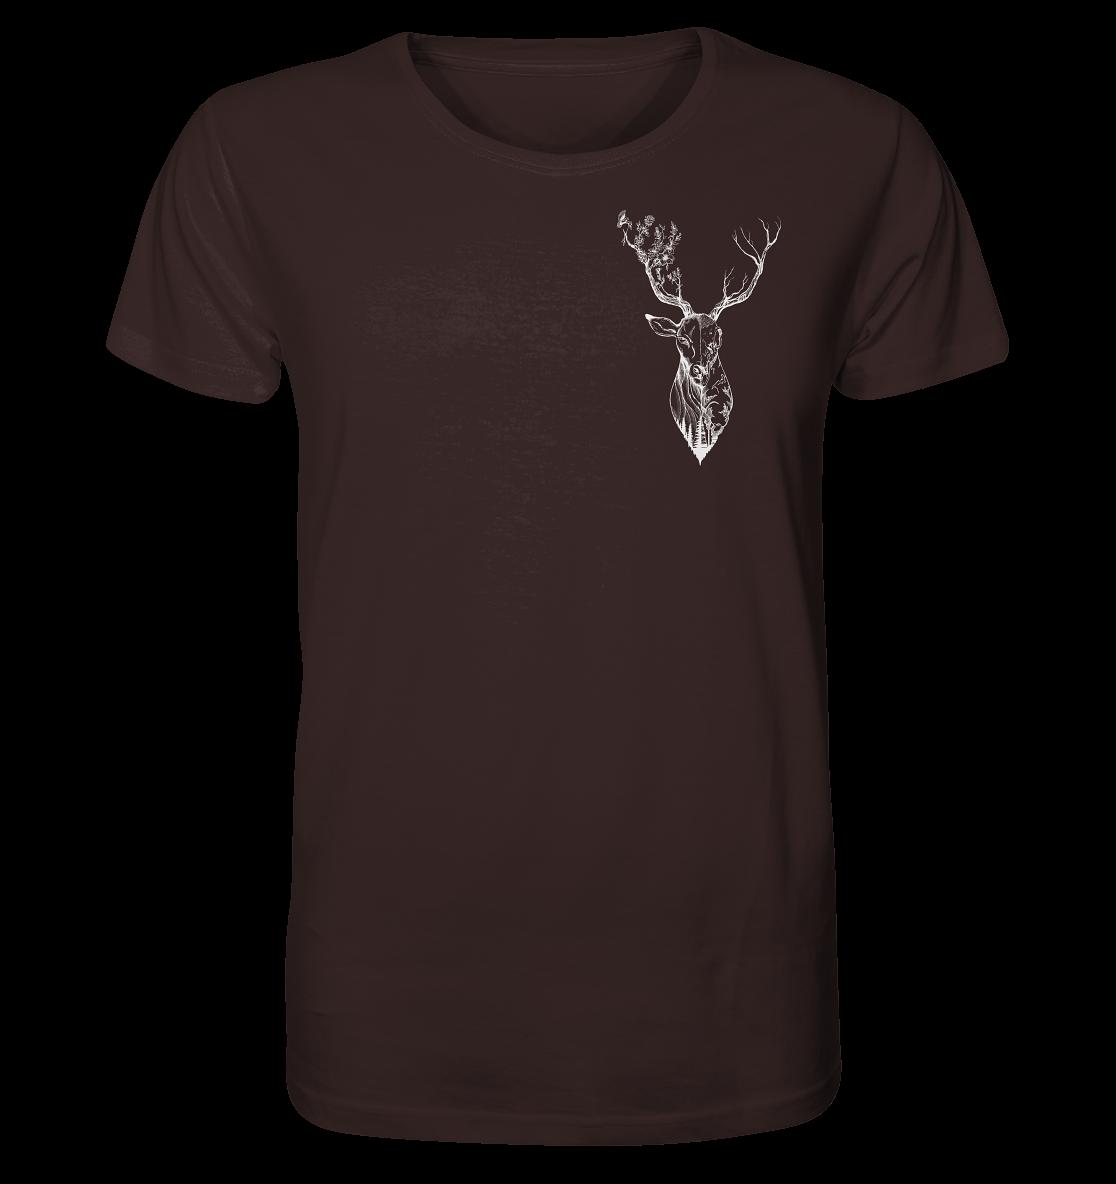 front-organic-shirt-372726-1116x-6.png